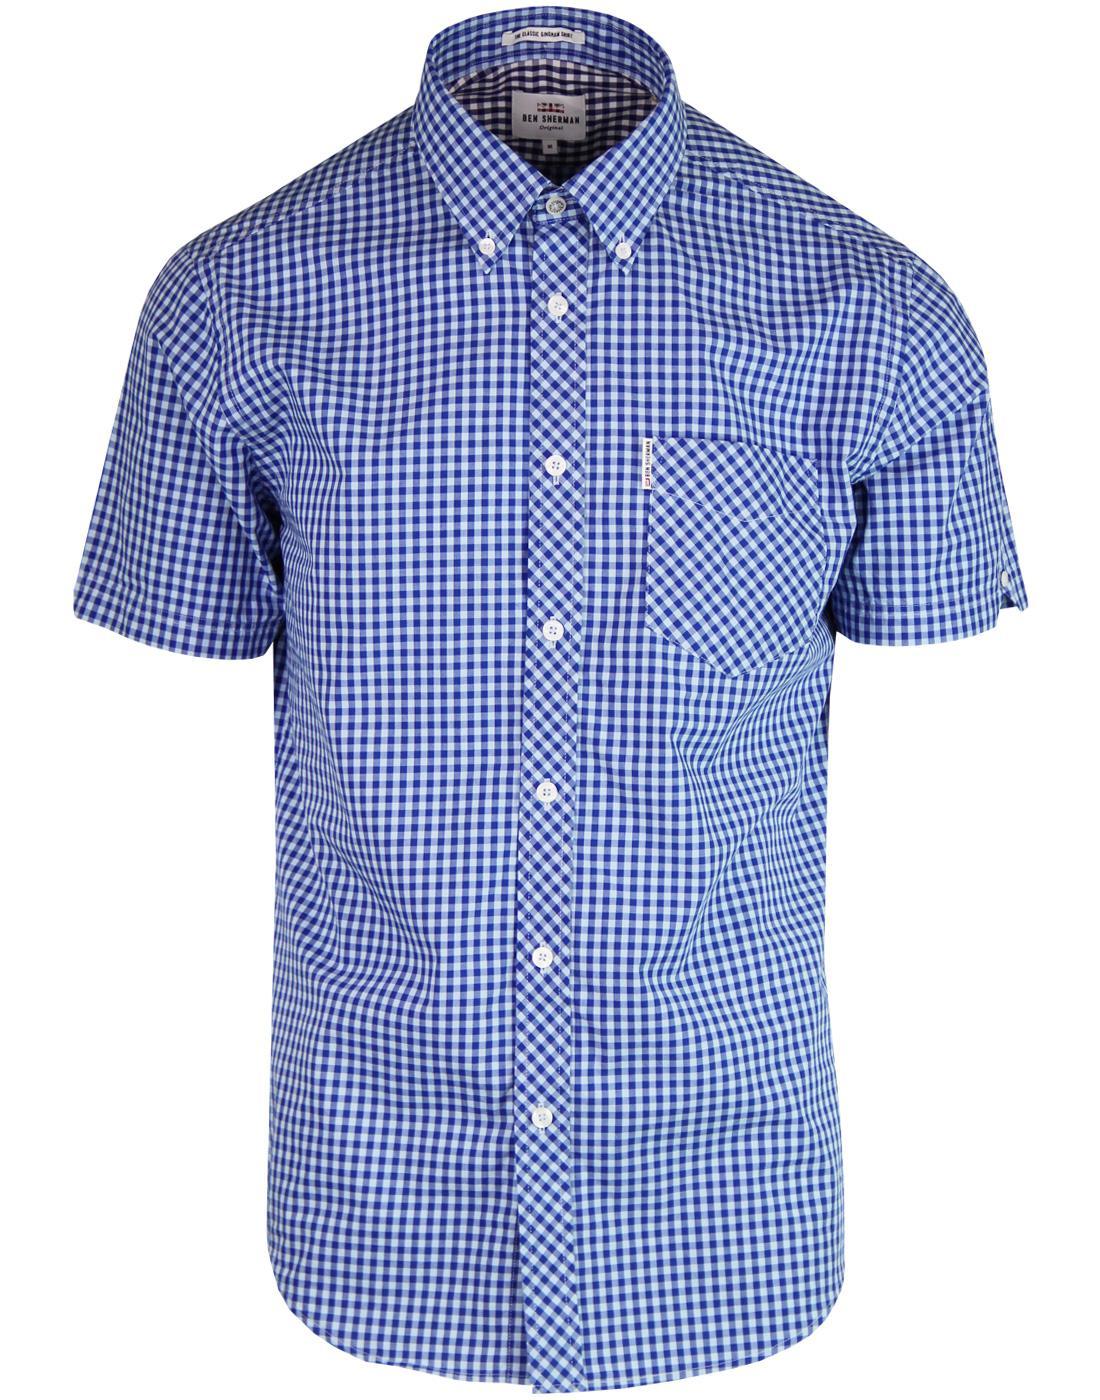 BEN SHERMAN 60s Mod Short Sleeve Gingham Shirt SKY